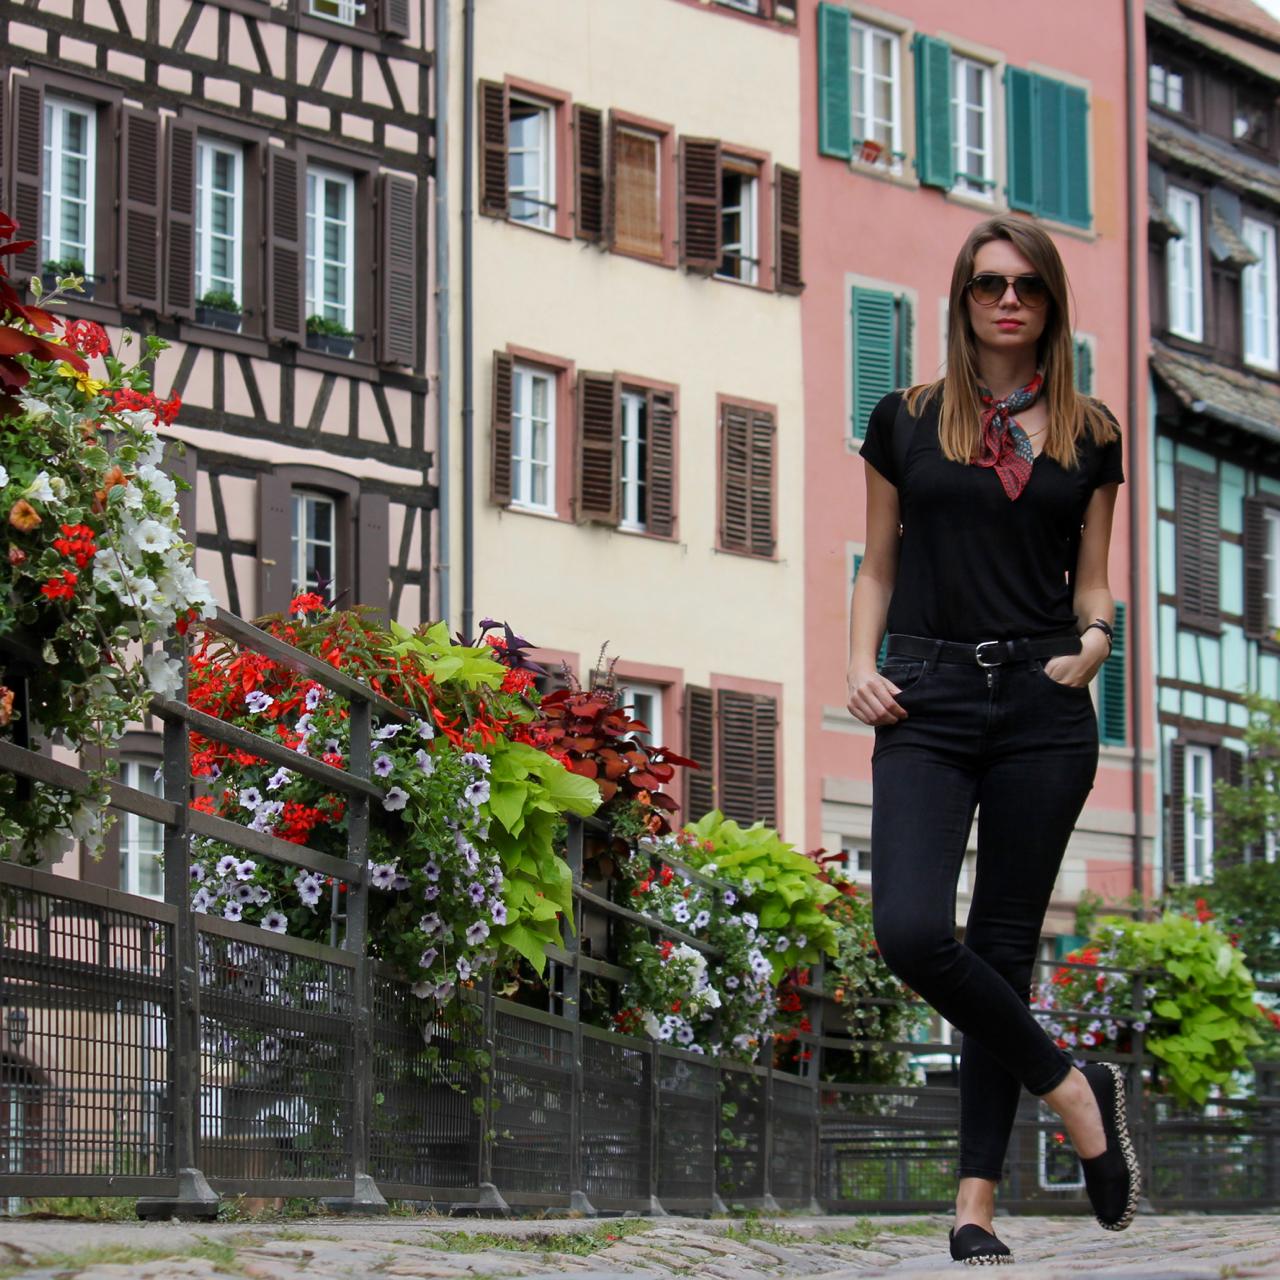 Strasbourg, France - 23